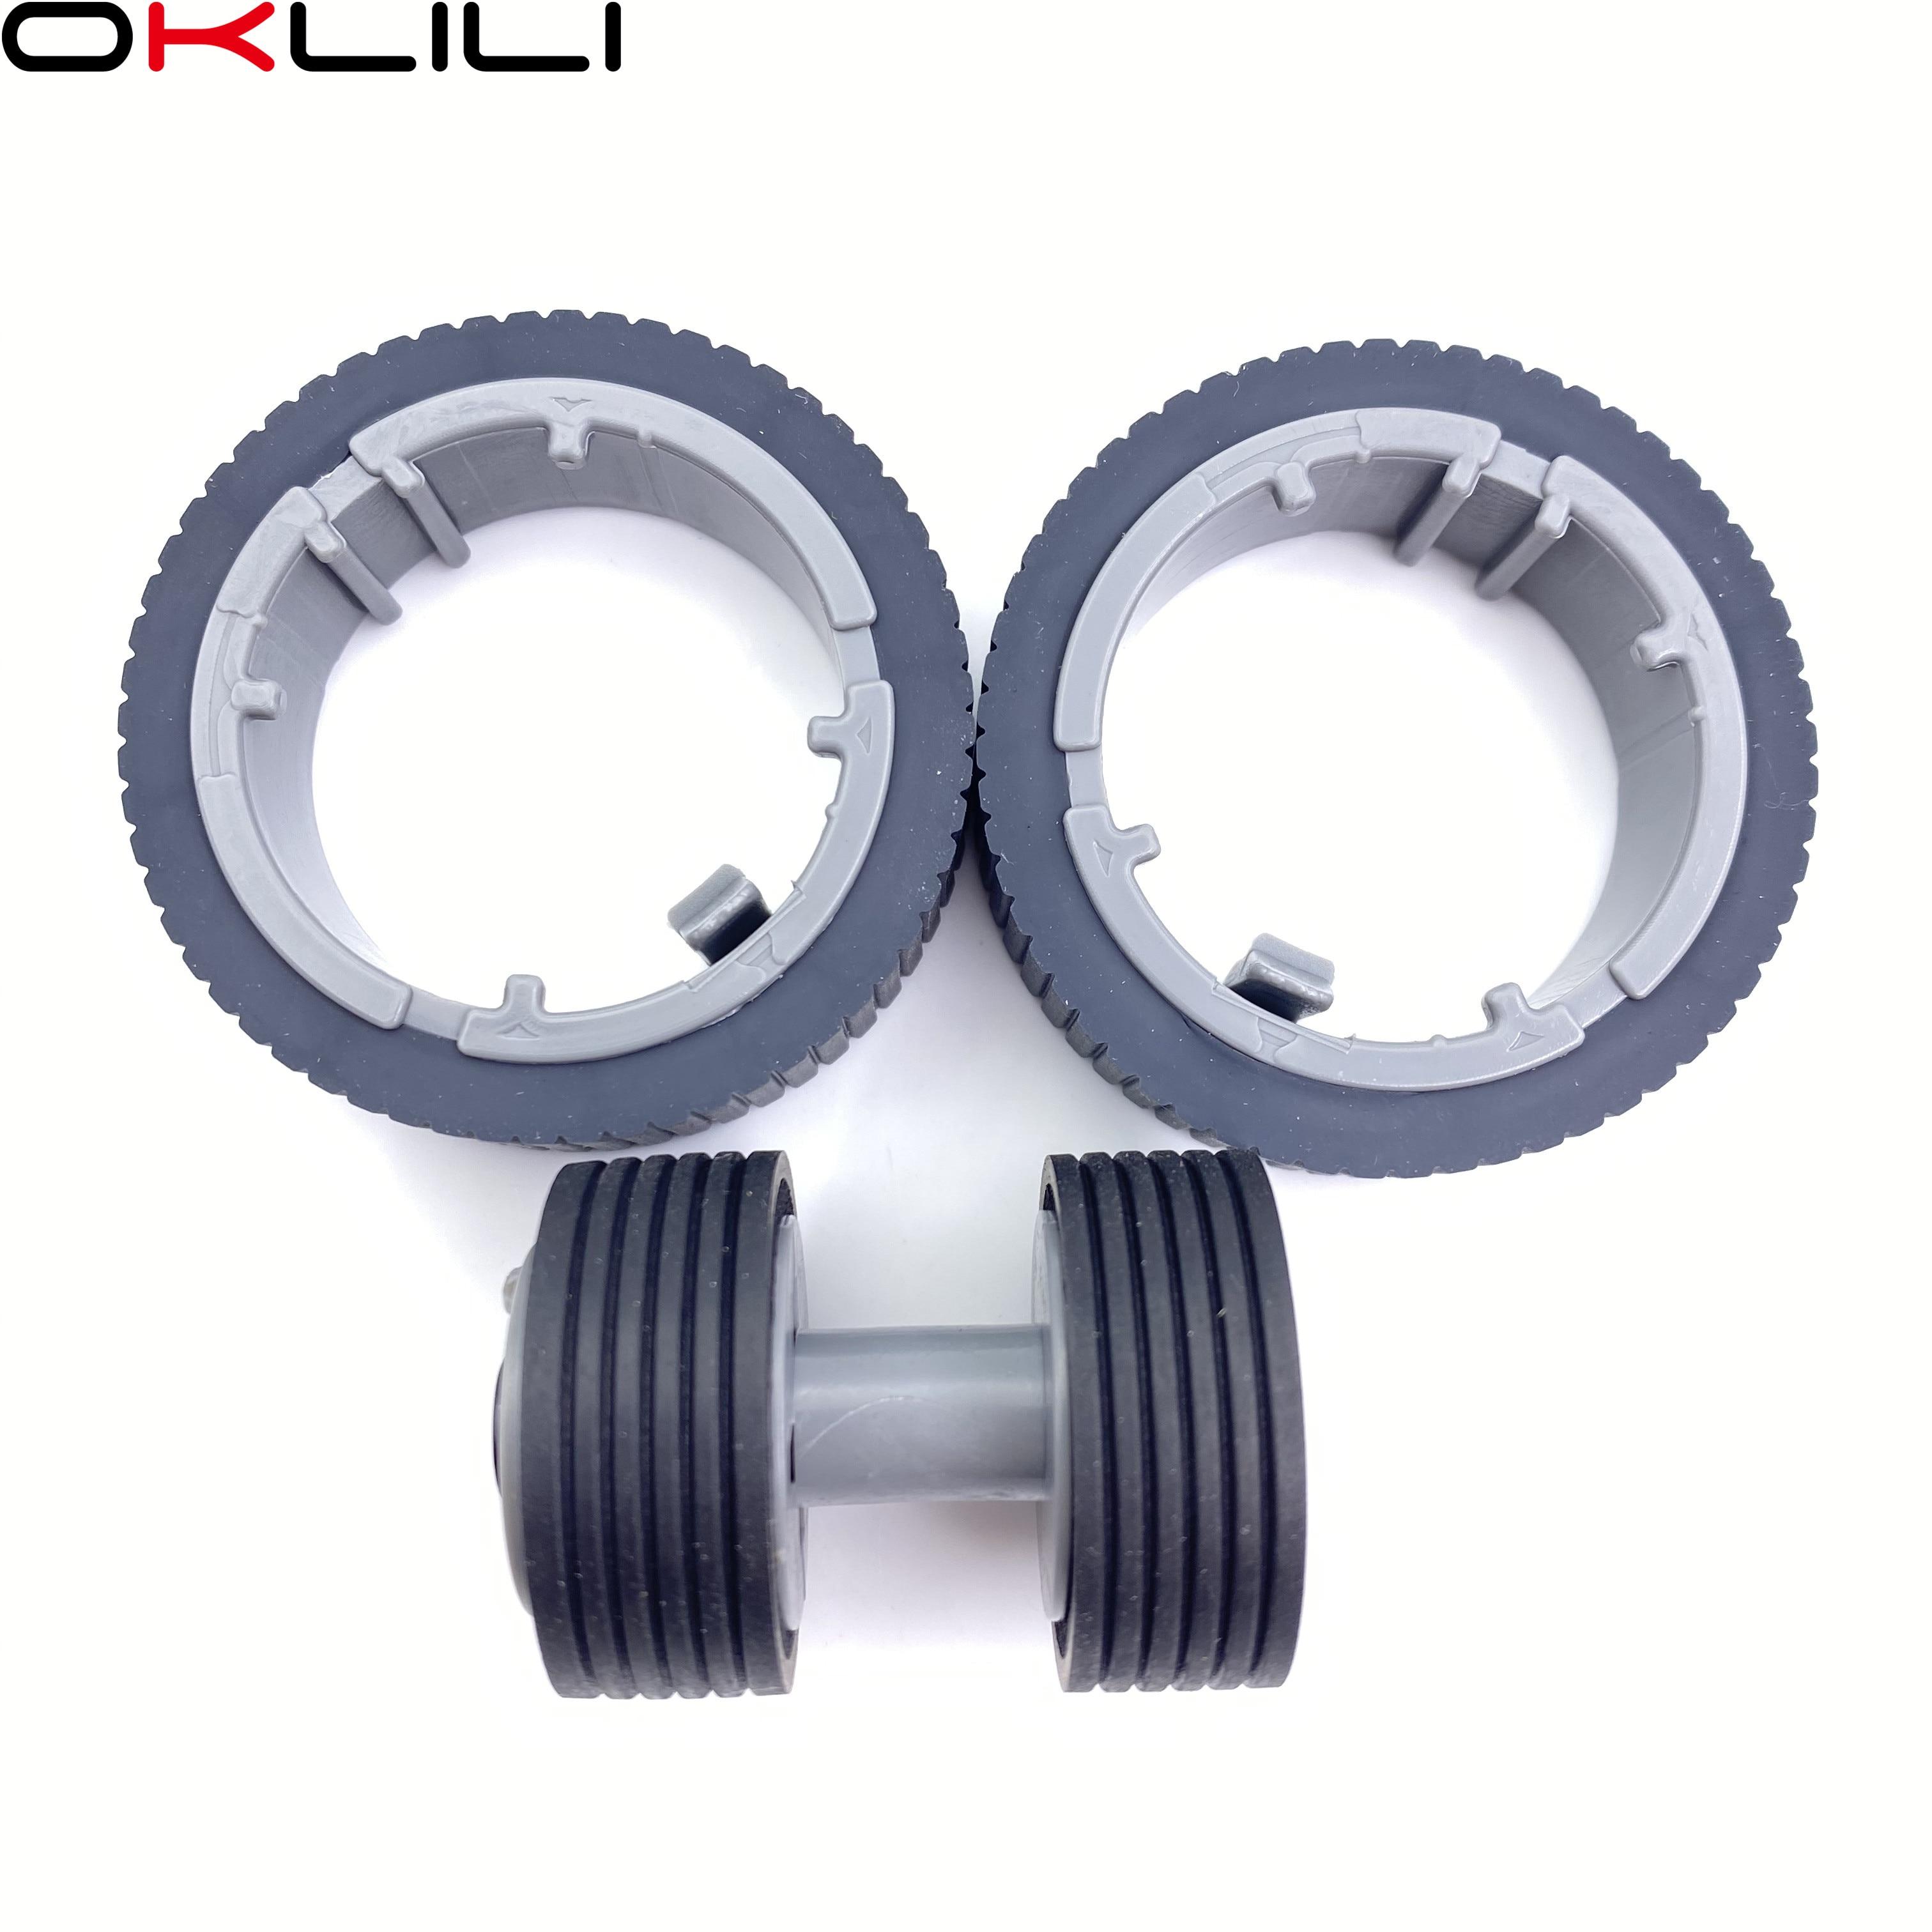 10X PA03670-0001 PA03670-0002 Consumable Kit Pick Roller Brake Roller Pickup Roller for Fujitsu fi-7160 fi-7260 fi-7180 fi-7280